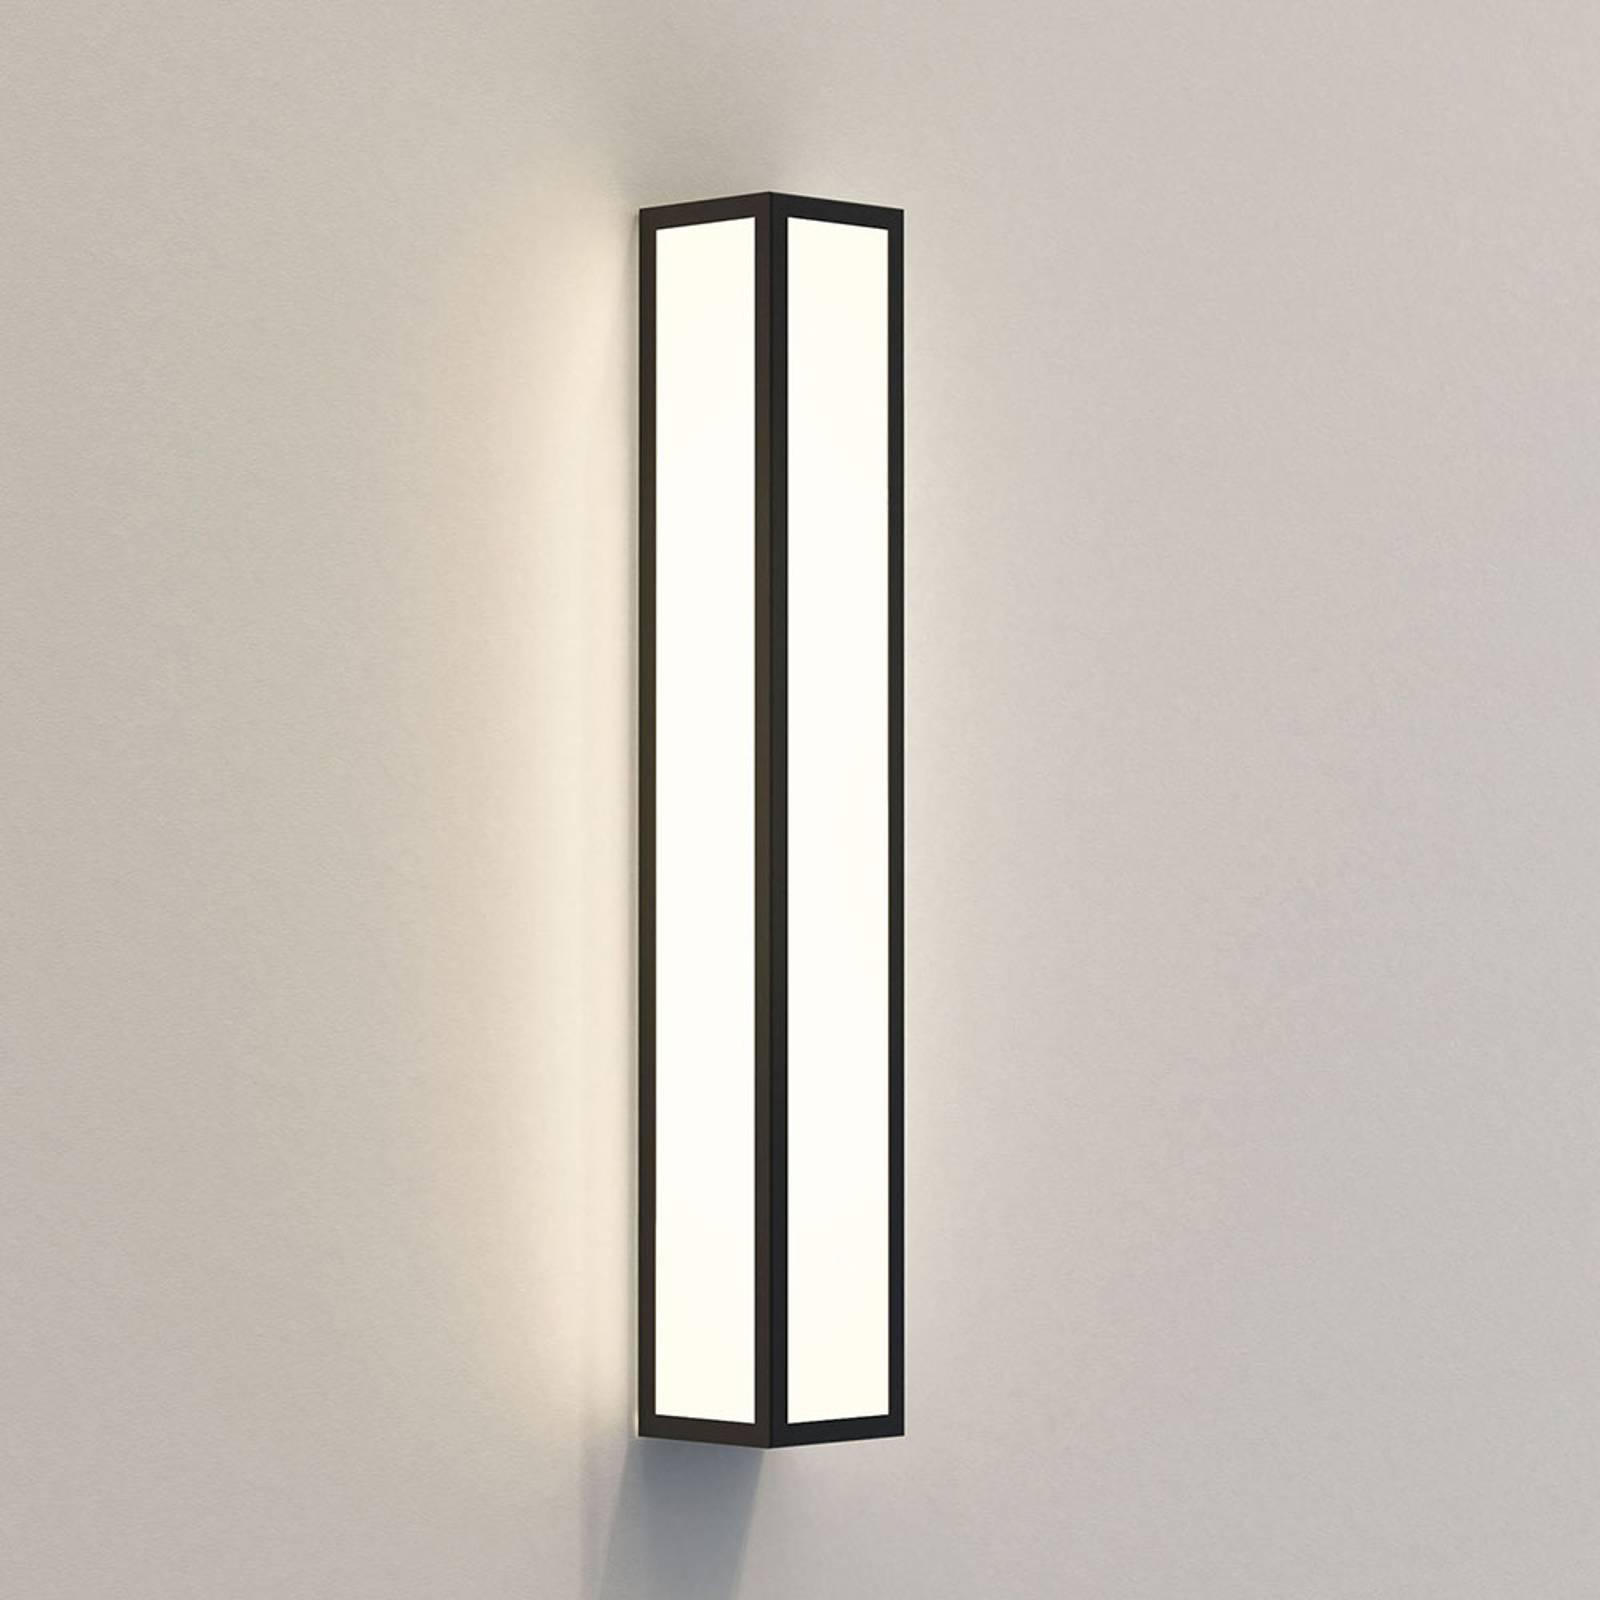 Astro Salerno 520 -LED-ulkoseinälamppu 52 cm musta